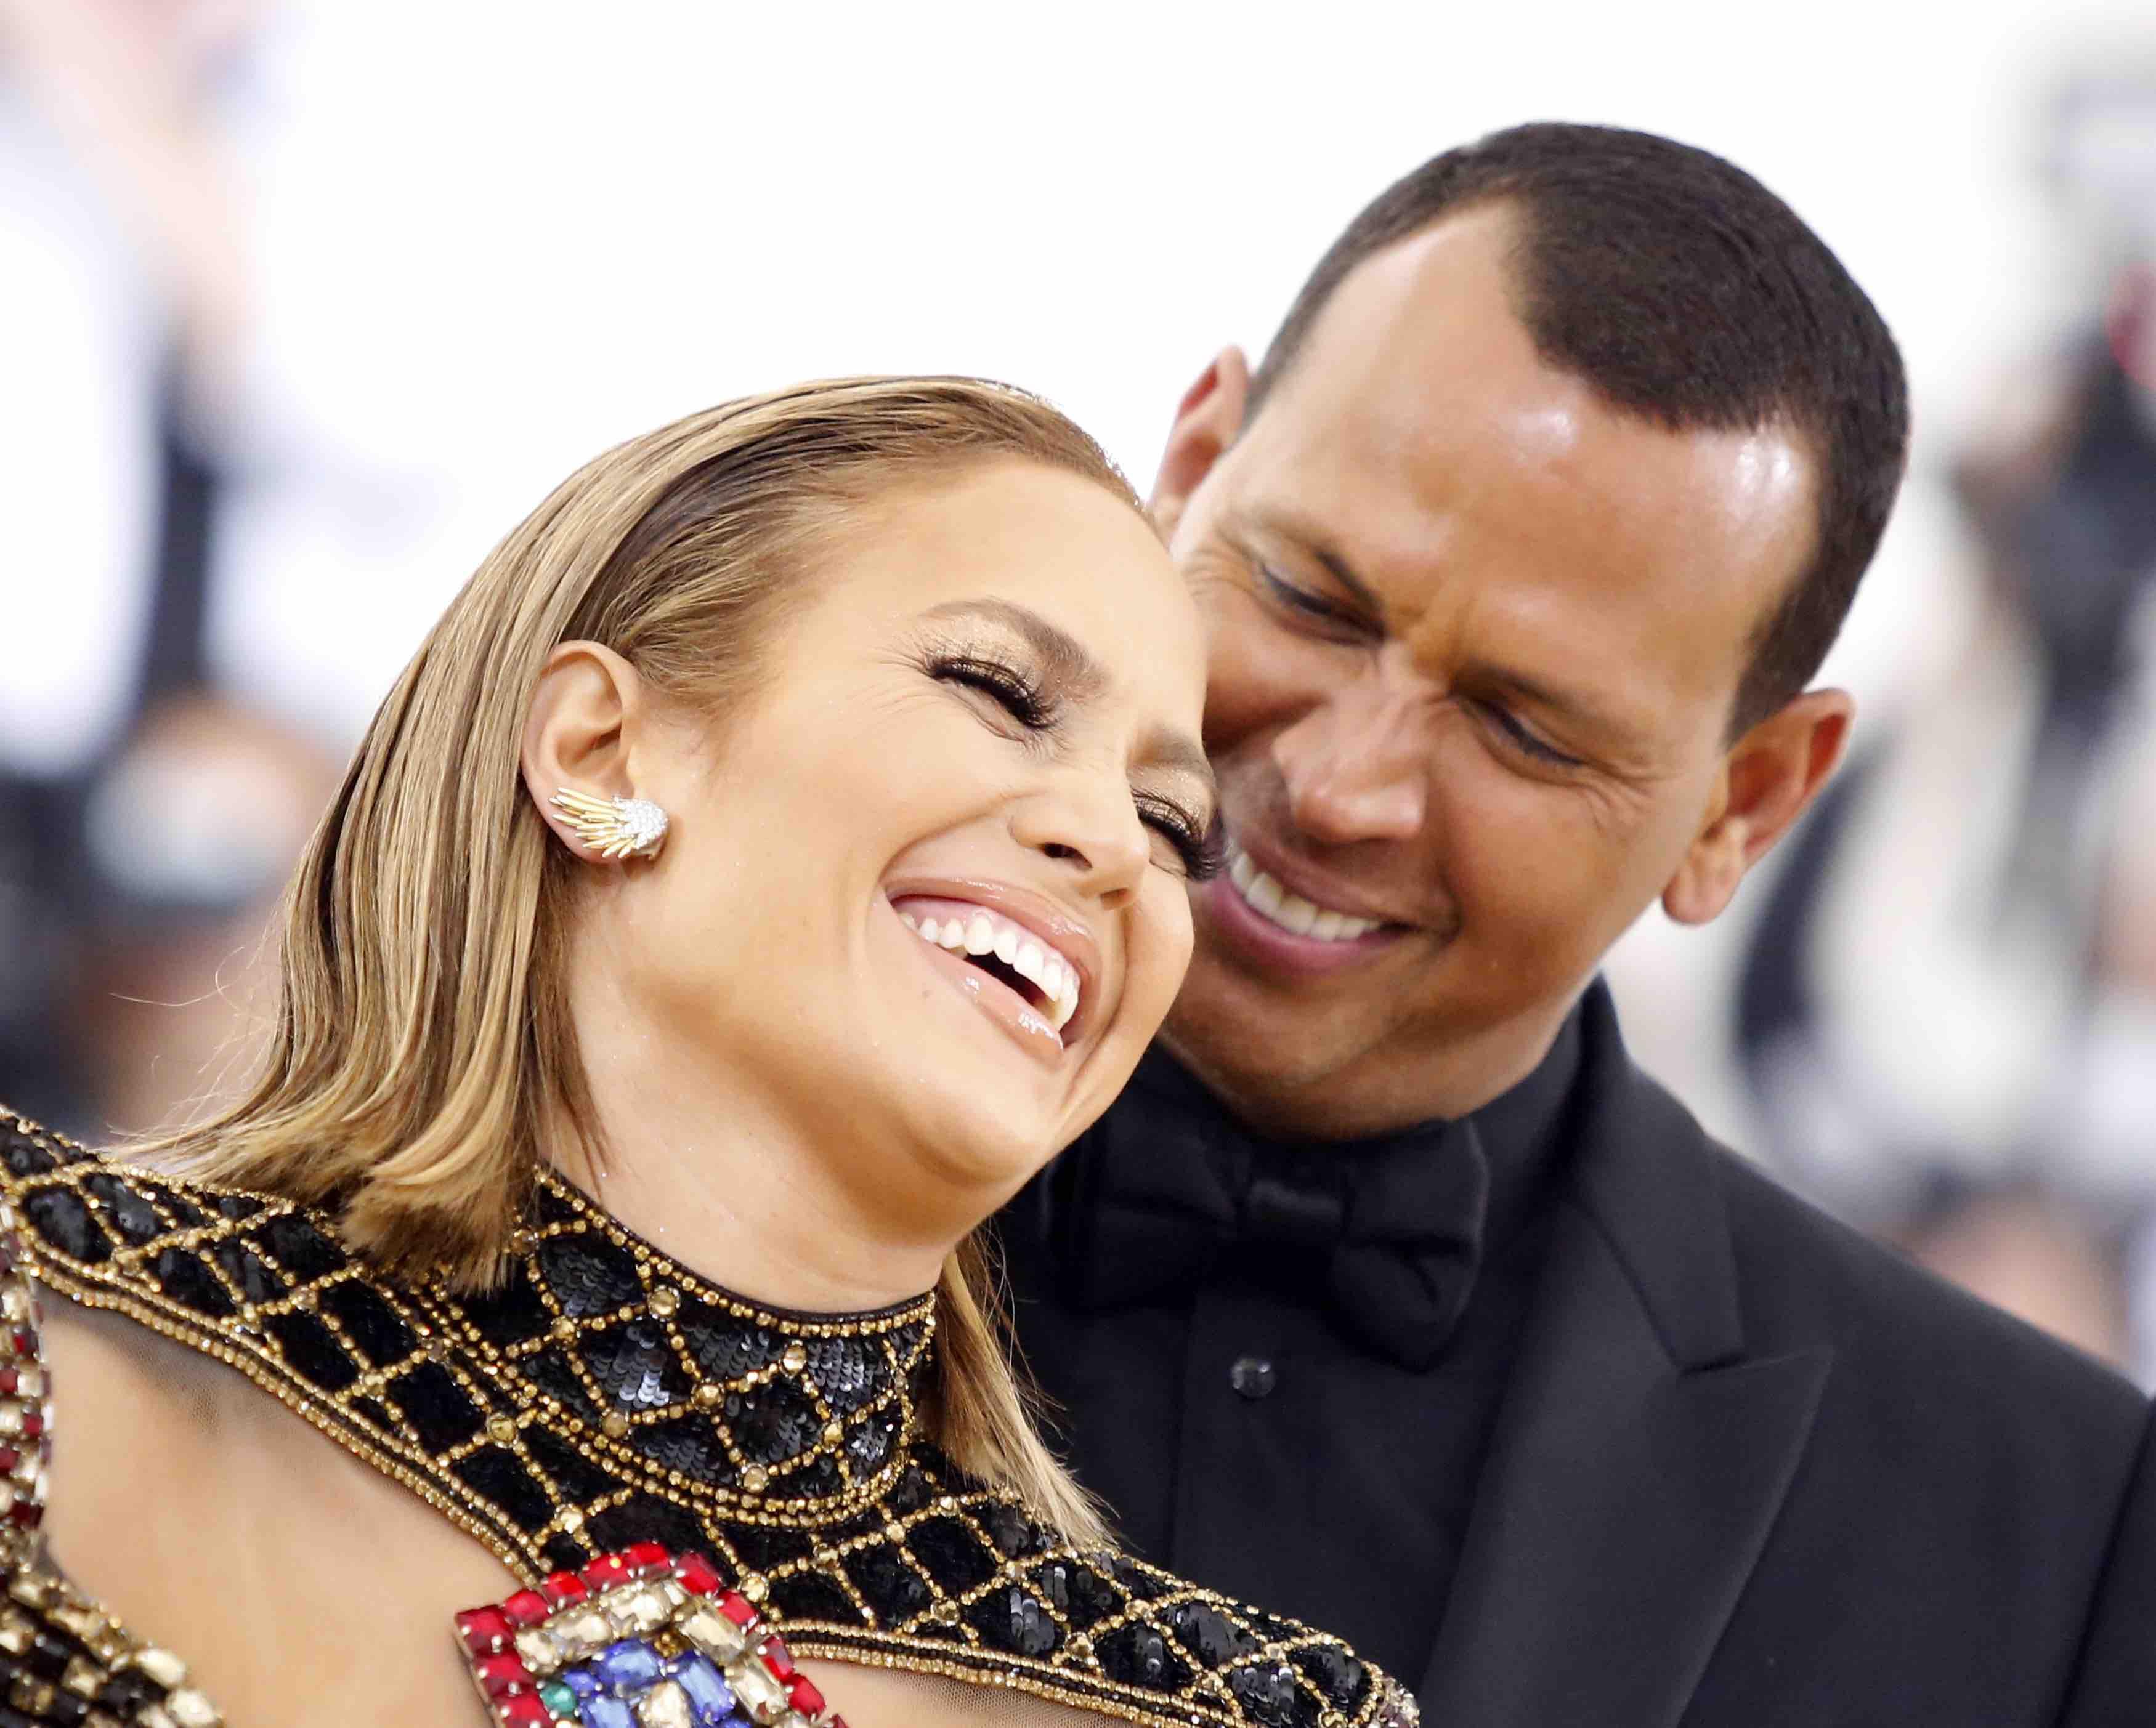 In a 1998 Interview, Alex Rodriguez Described His Dream Date as Jennifer Lopez